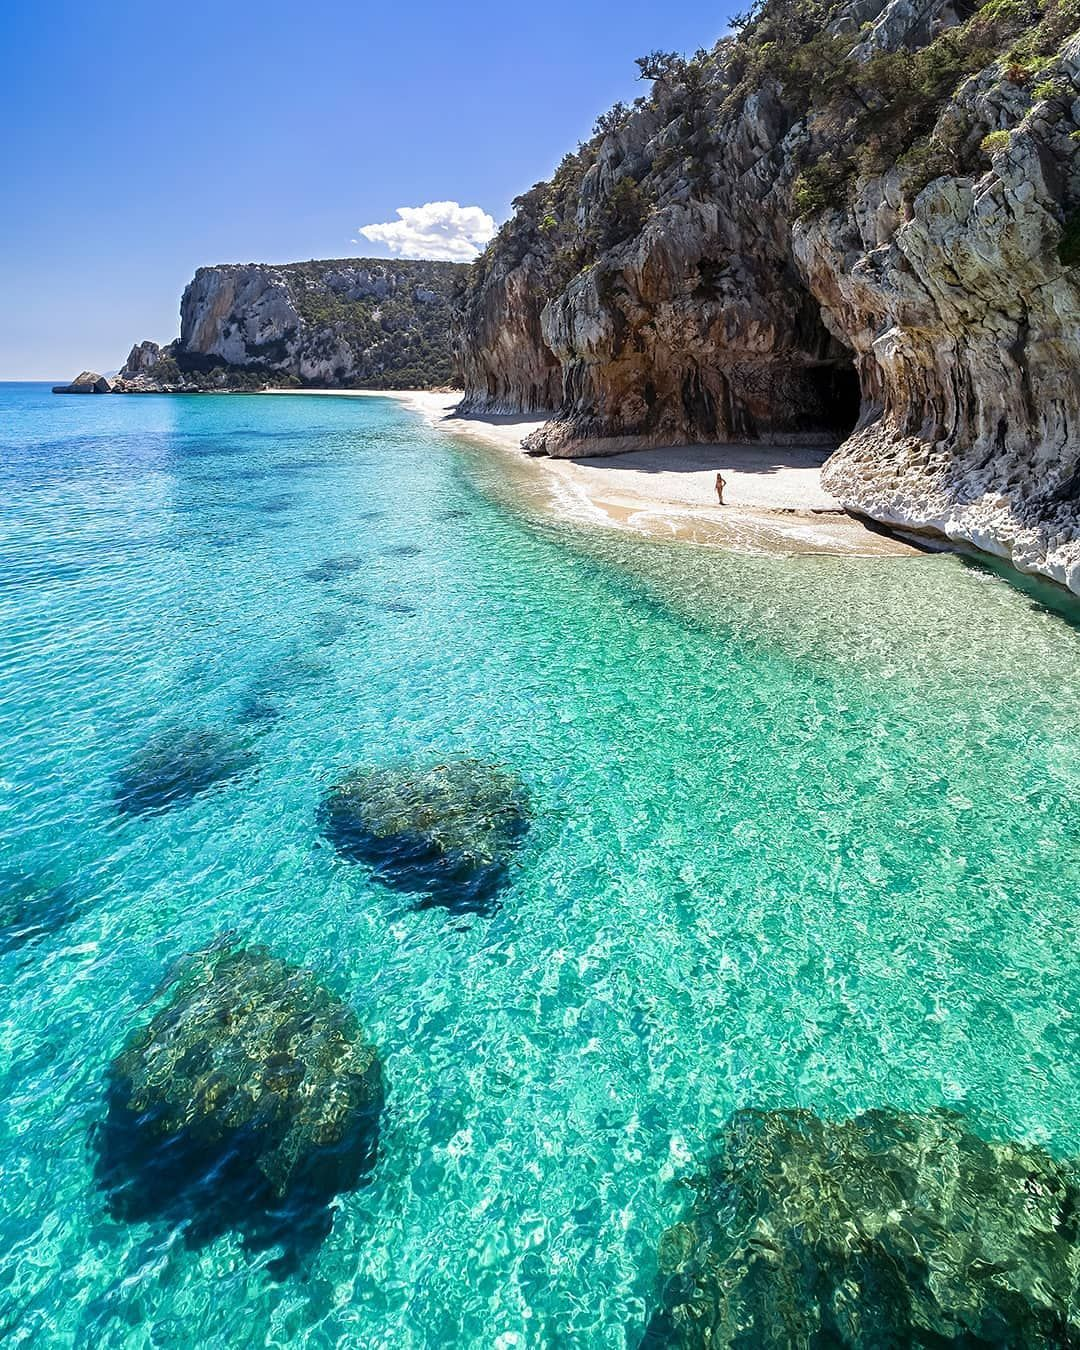 10 Best Scuba Diving Beaches In The Caribbean In 2020